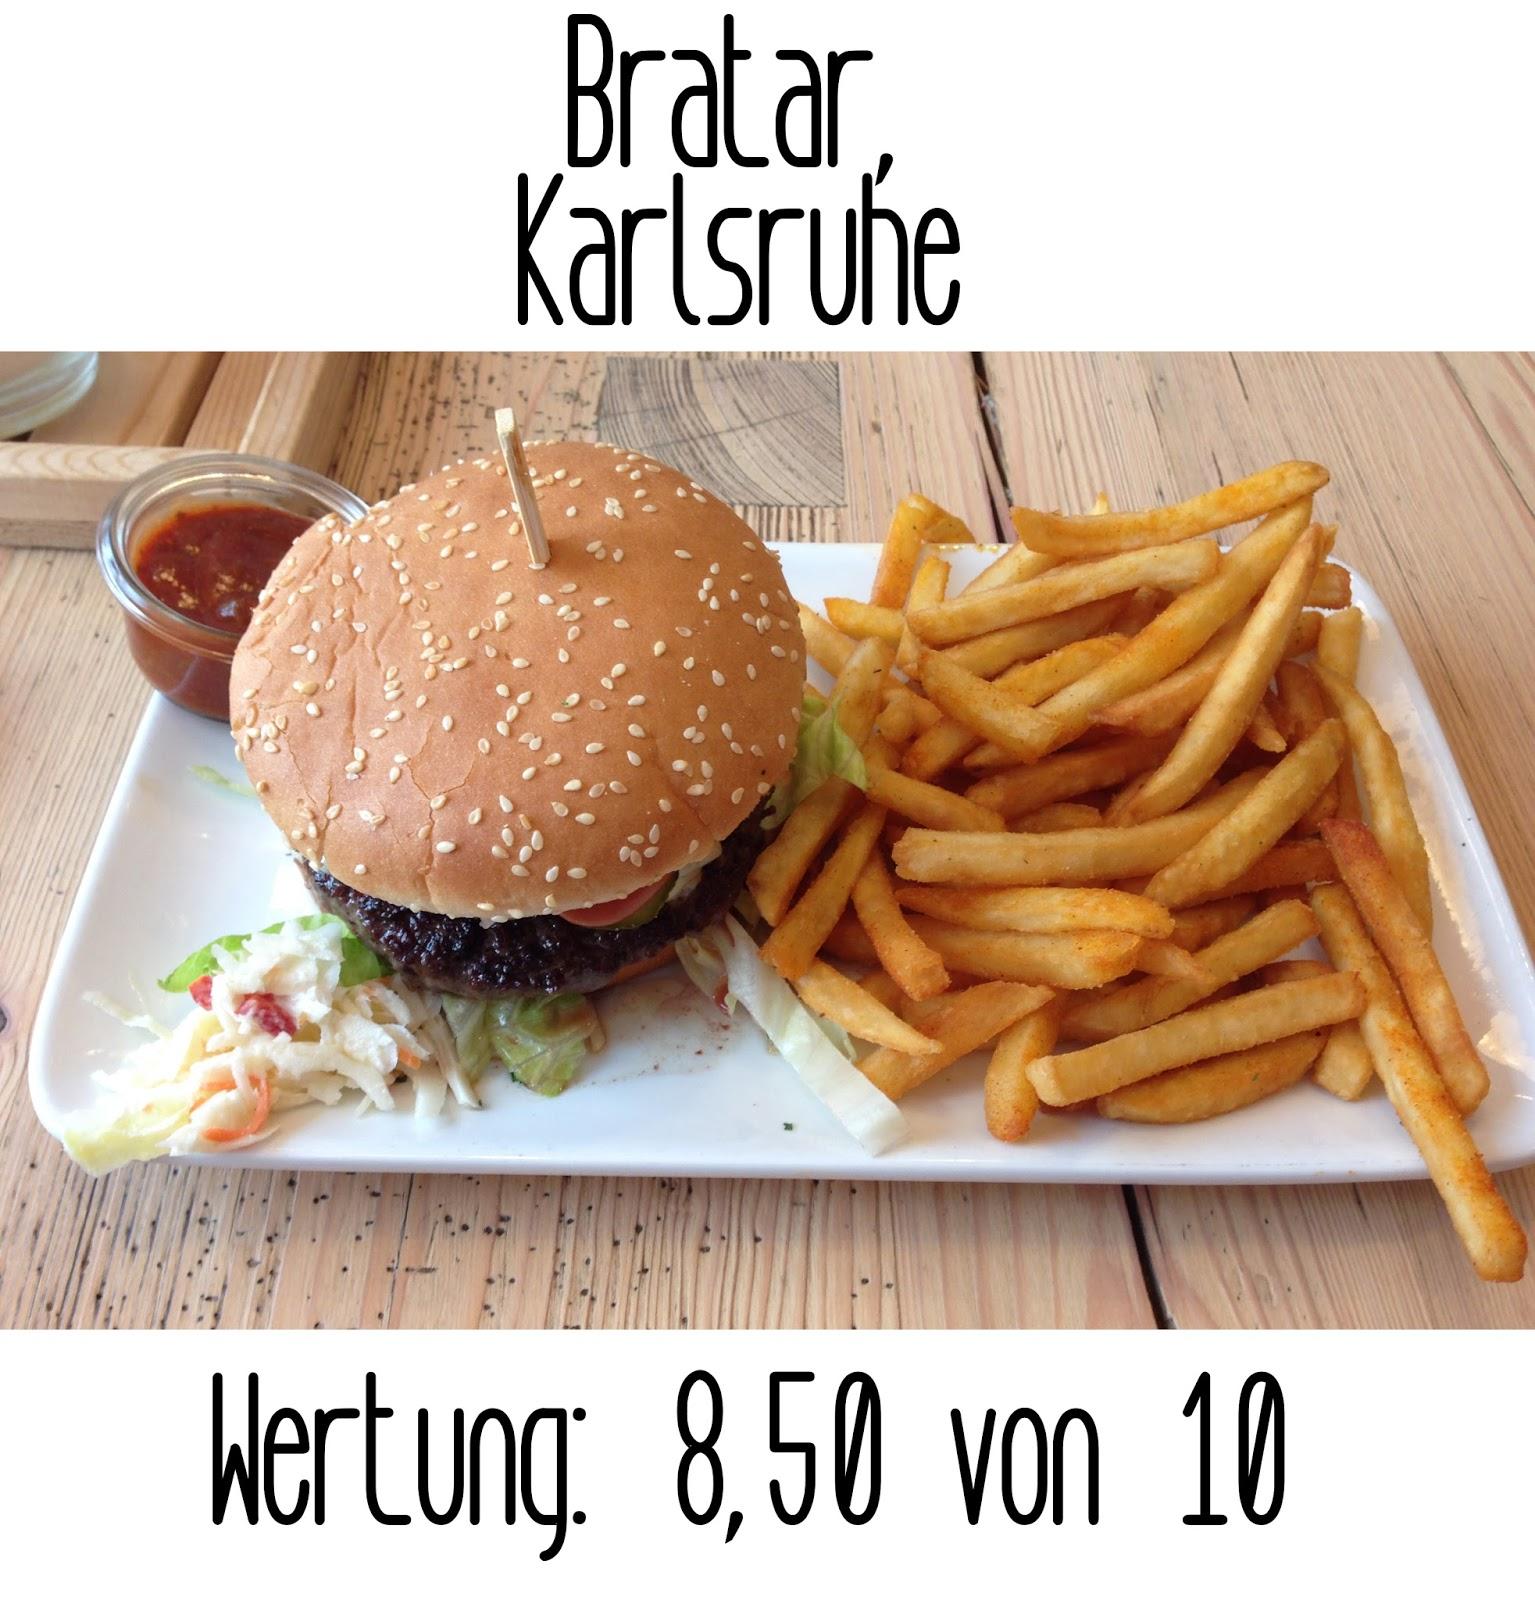 Germanys Best Burger Bratar Karlsruhe